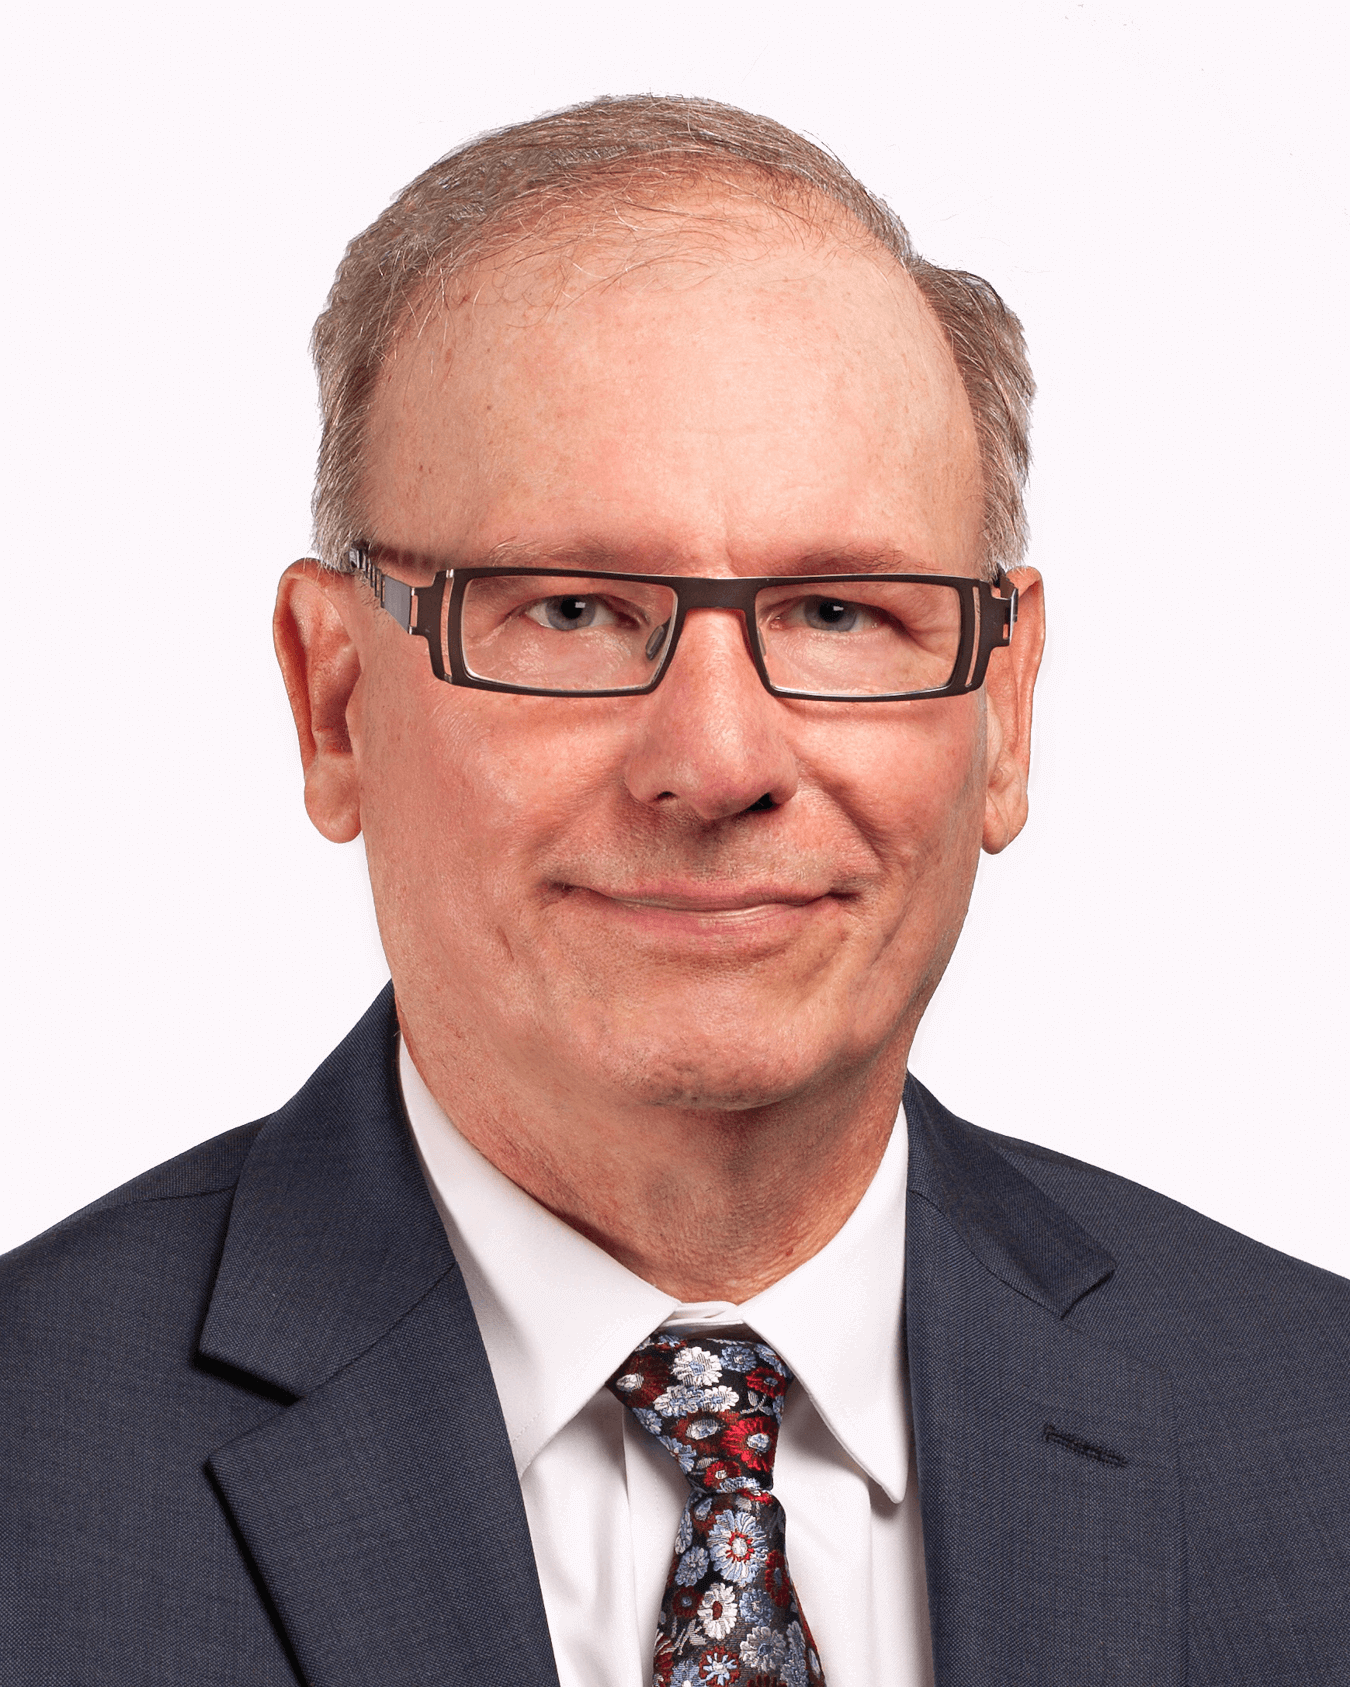 Attorney John D. Briggs